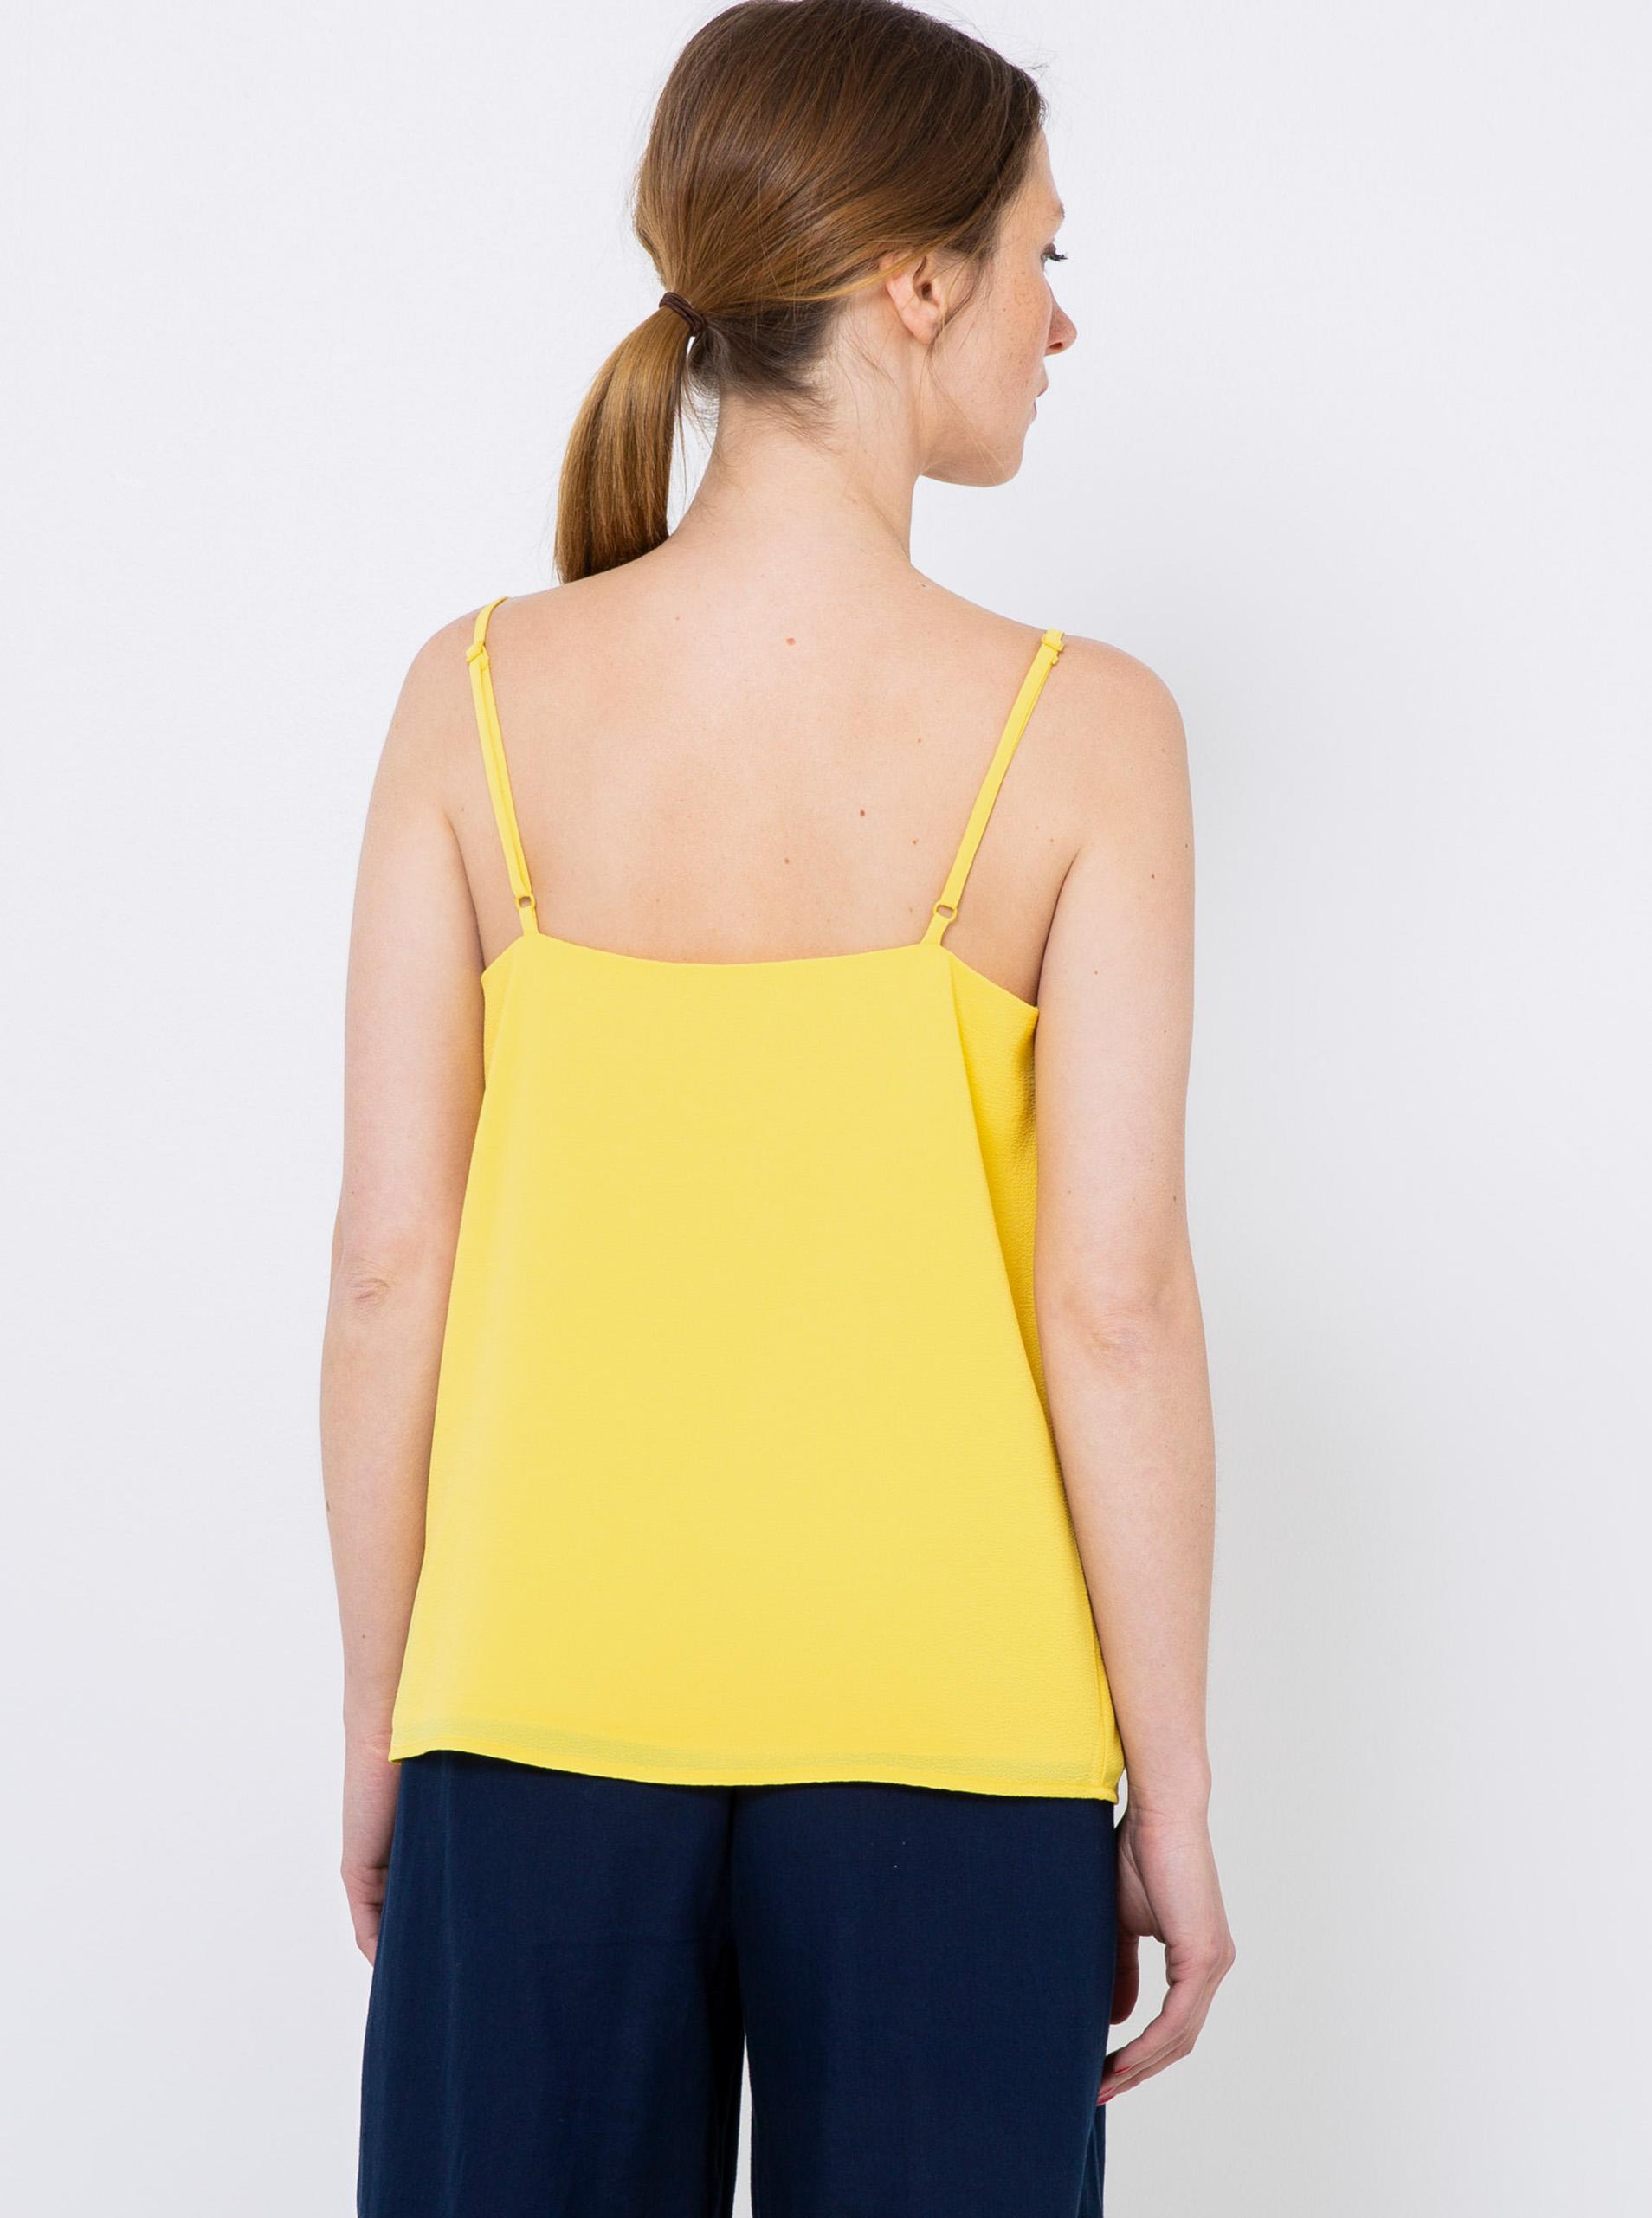 CAMAIEU yellow women´s top